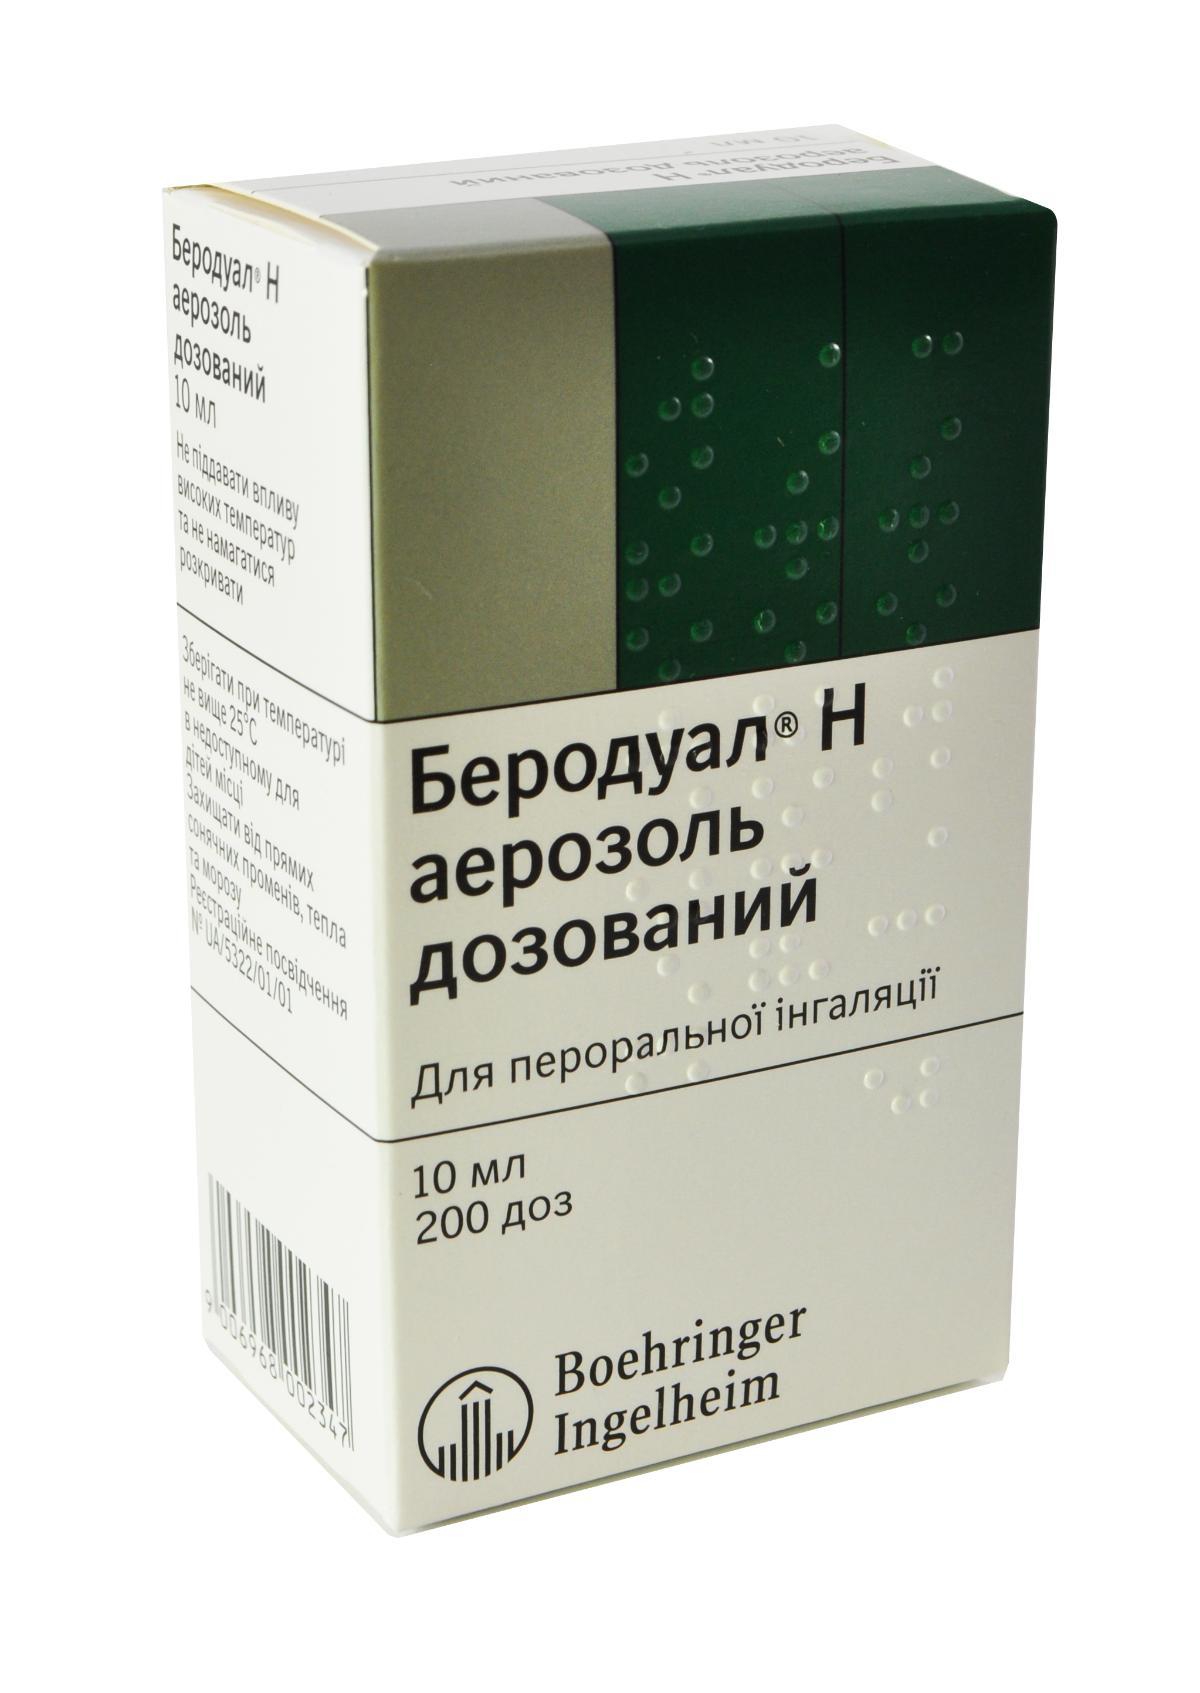 3080 БЕРОДУАЛ® Н - Fenoterol and ipratropium bromide